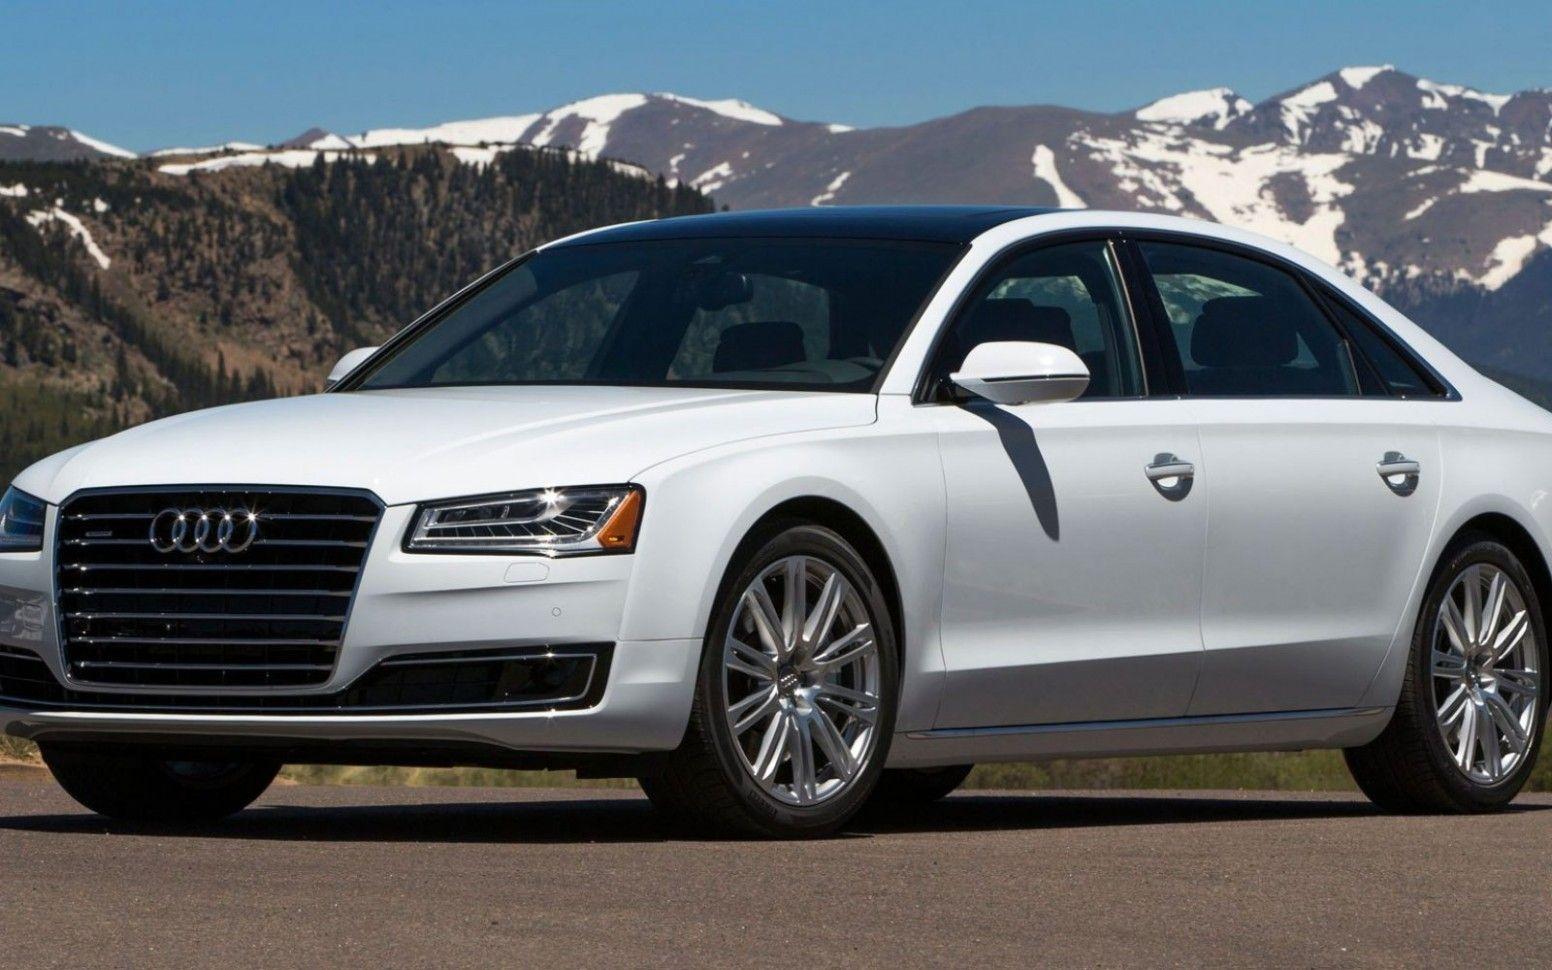 2020 Audi A9 Price And di 2020